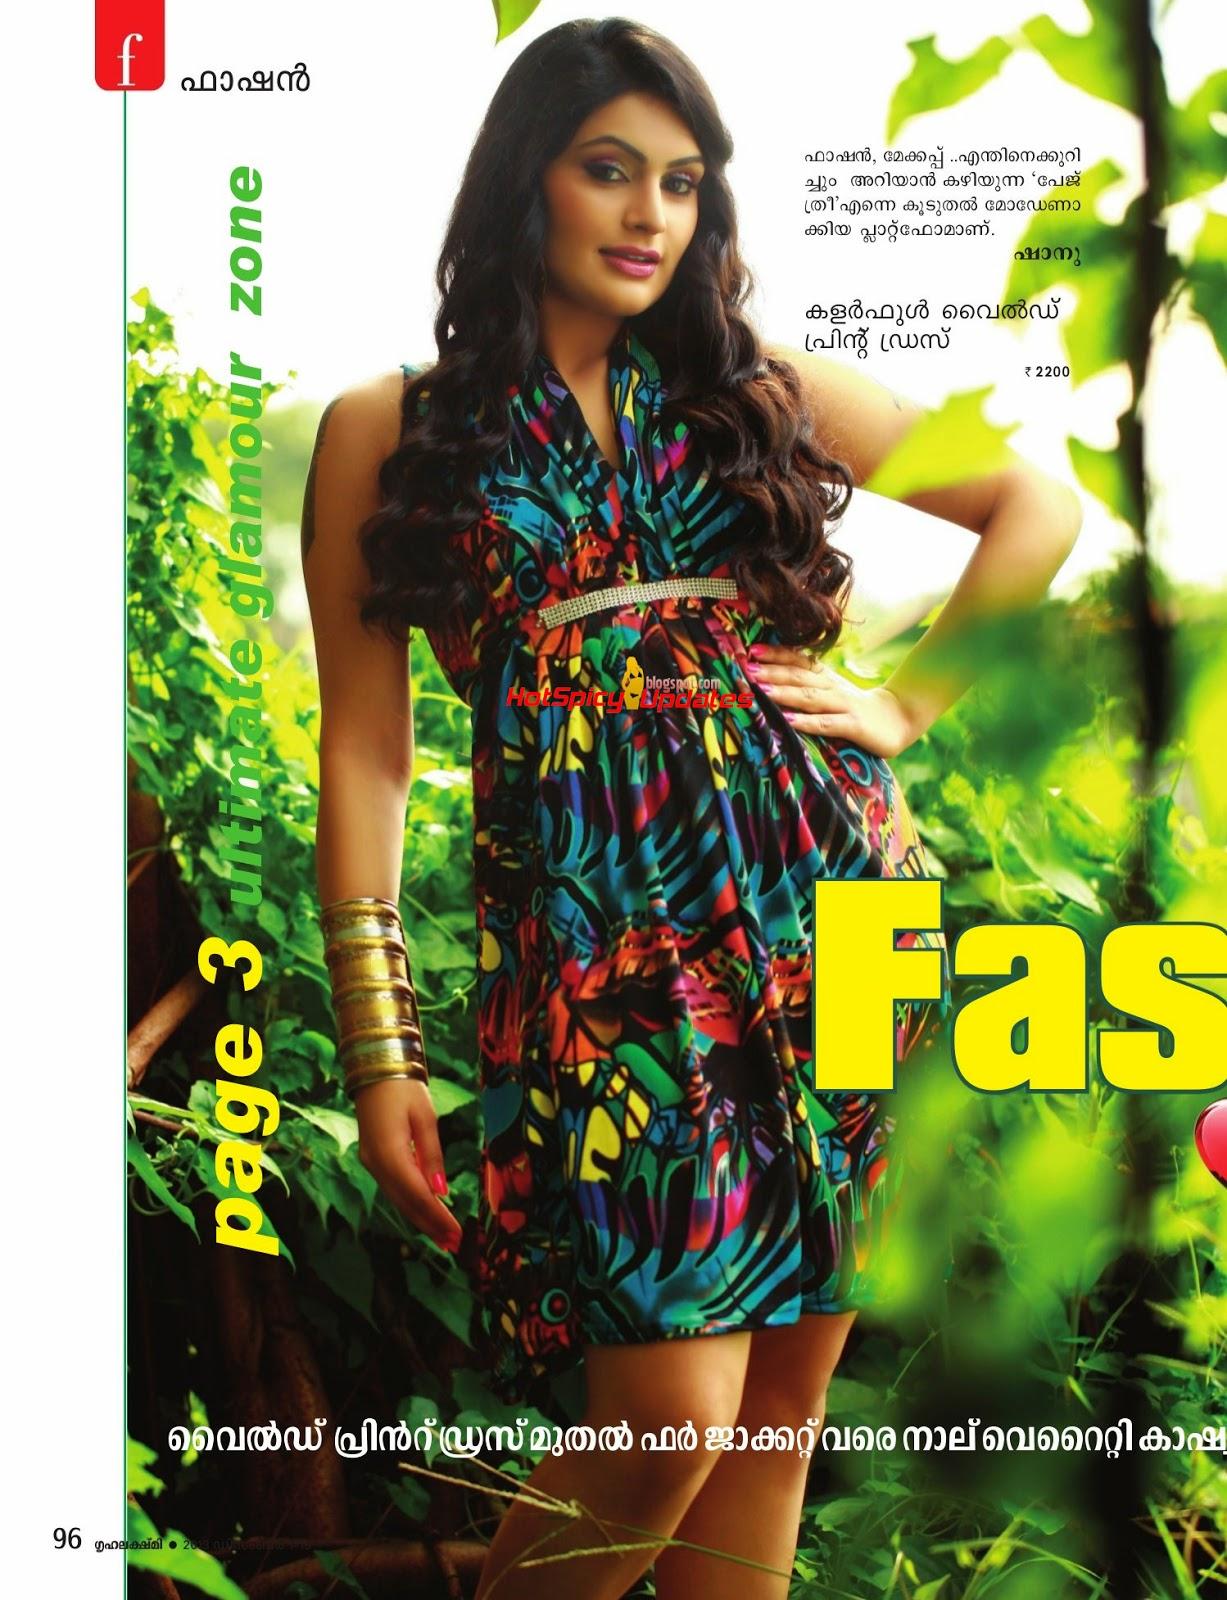 Malayalam actress ranjini hot unseen boobs squeezed - 1 4